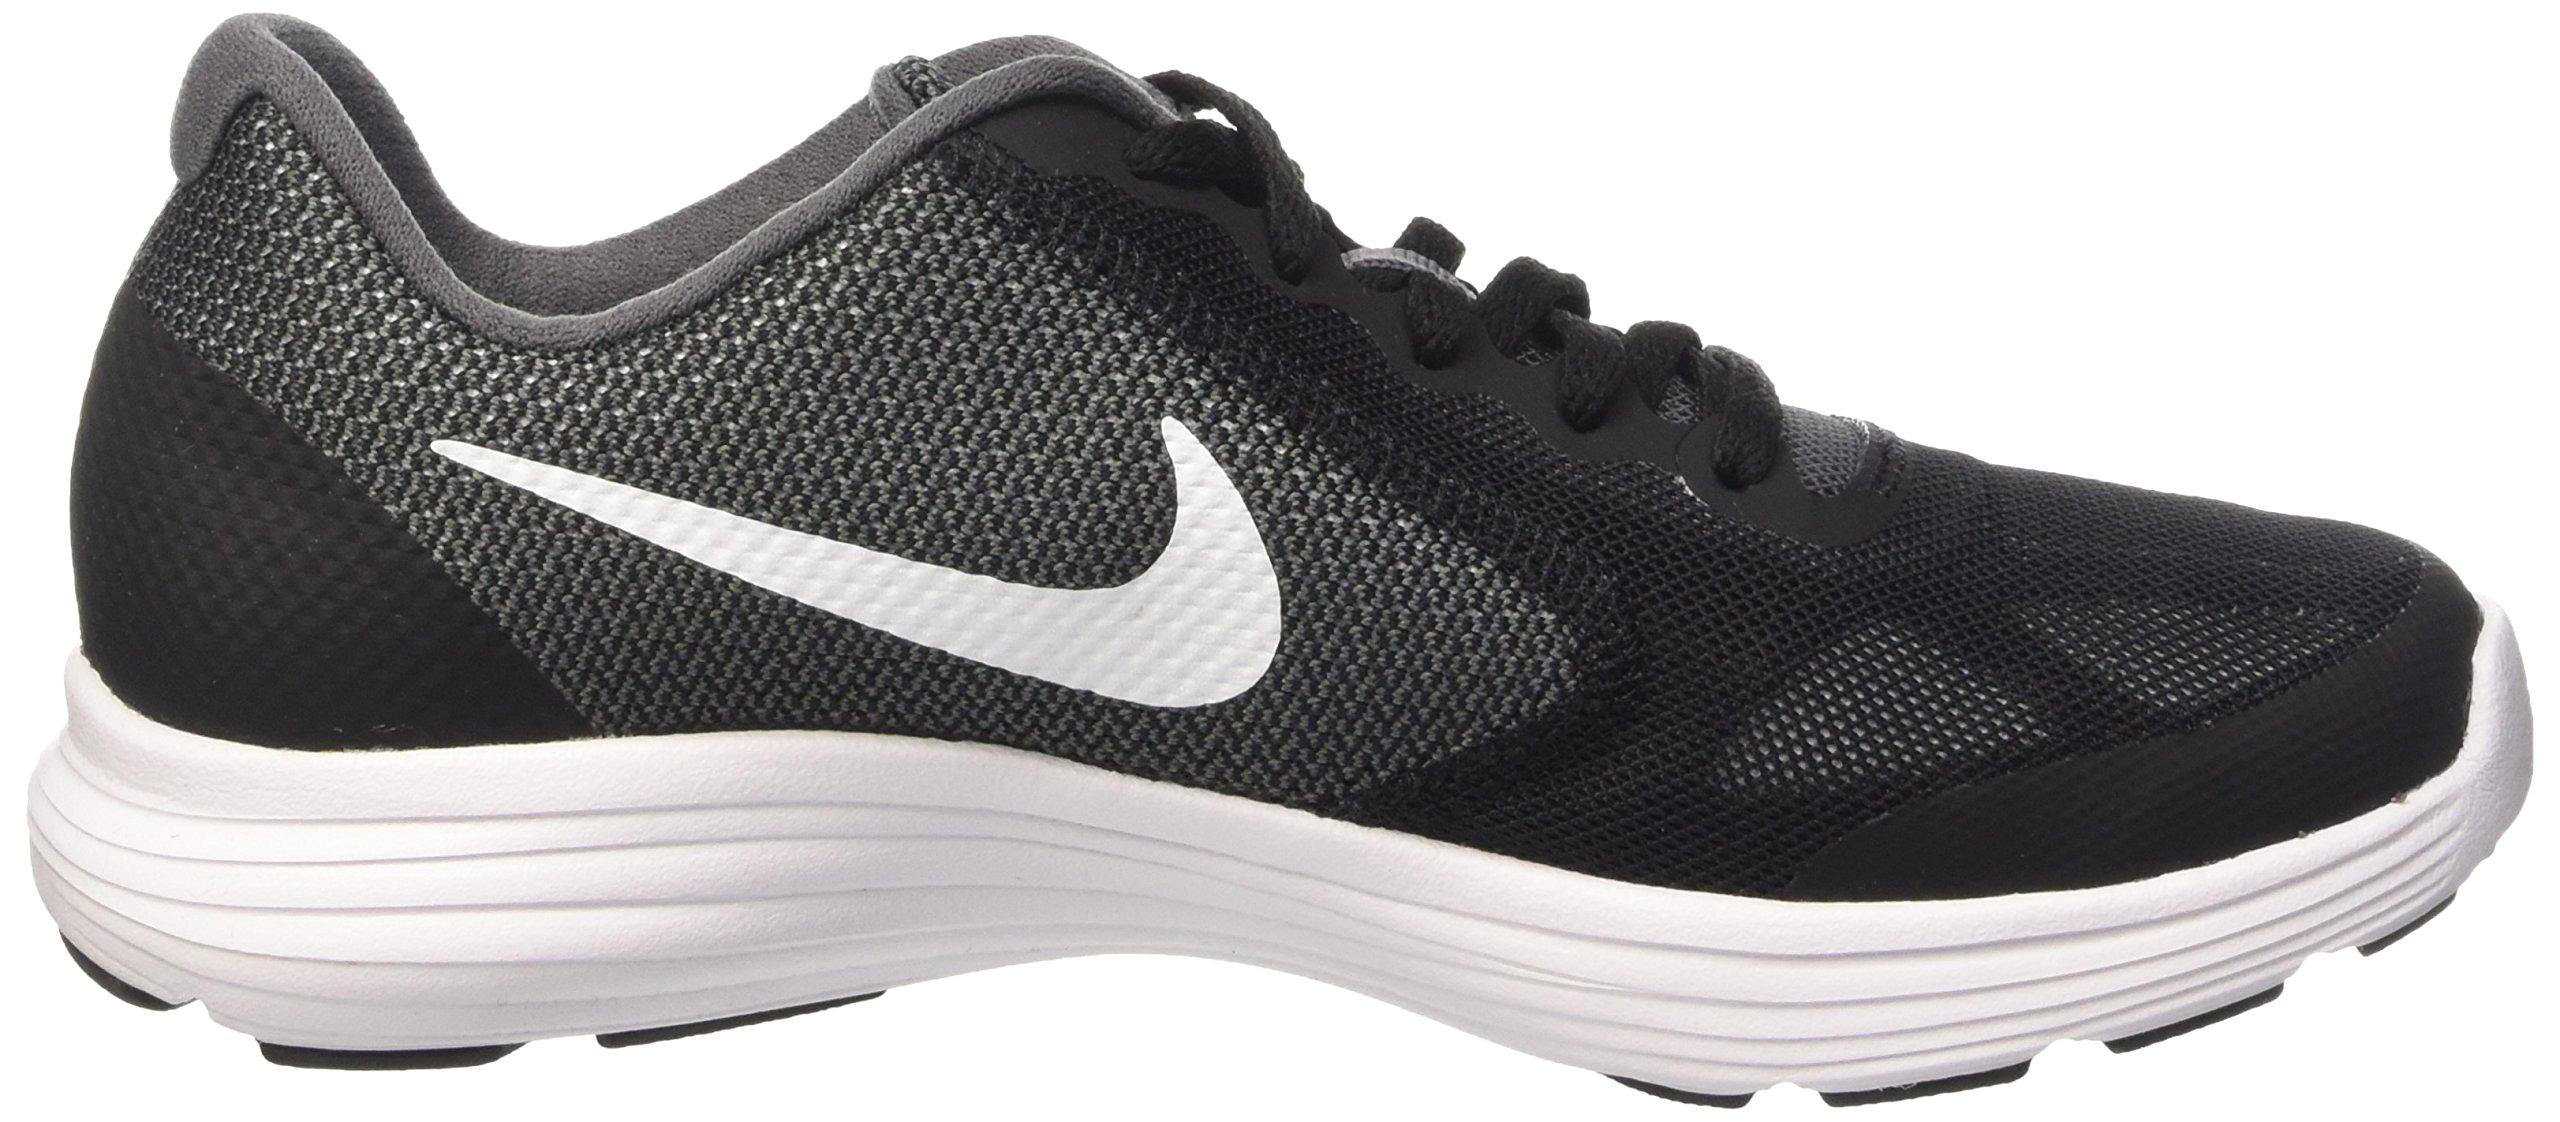 Nike Boys' Revolution 3 (GS) Running Shoe Dark Grey/White/Black/Pure Platinum 3.5 M US Big Kid by Nike (Image #6)